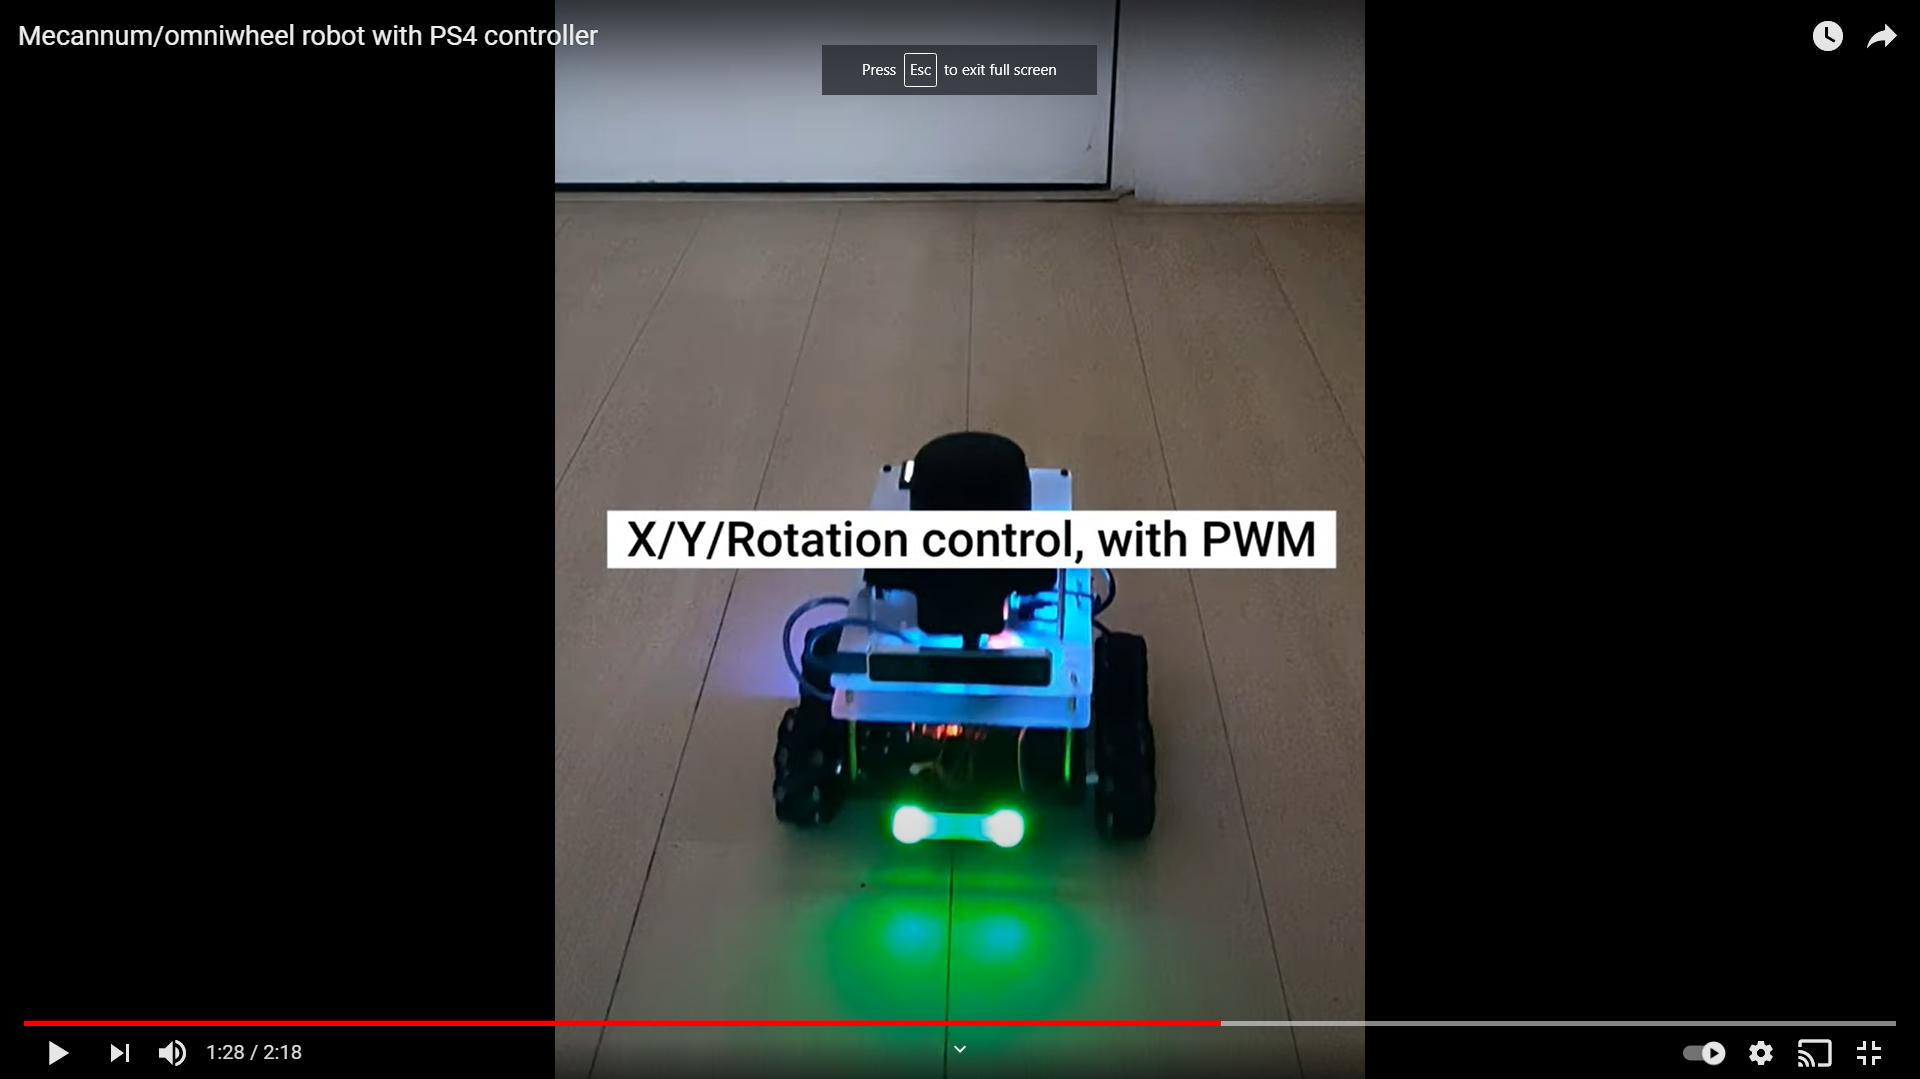 Mecannum/omniwheel robot with PS4 controller